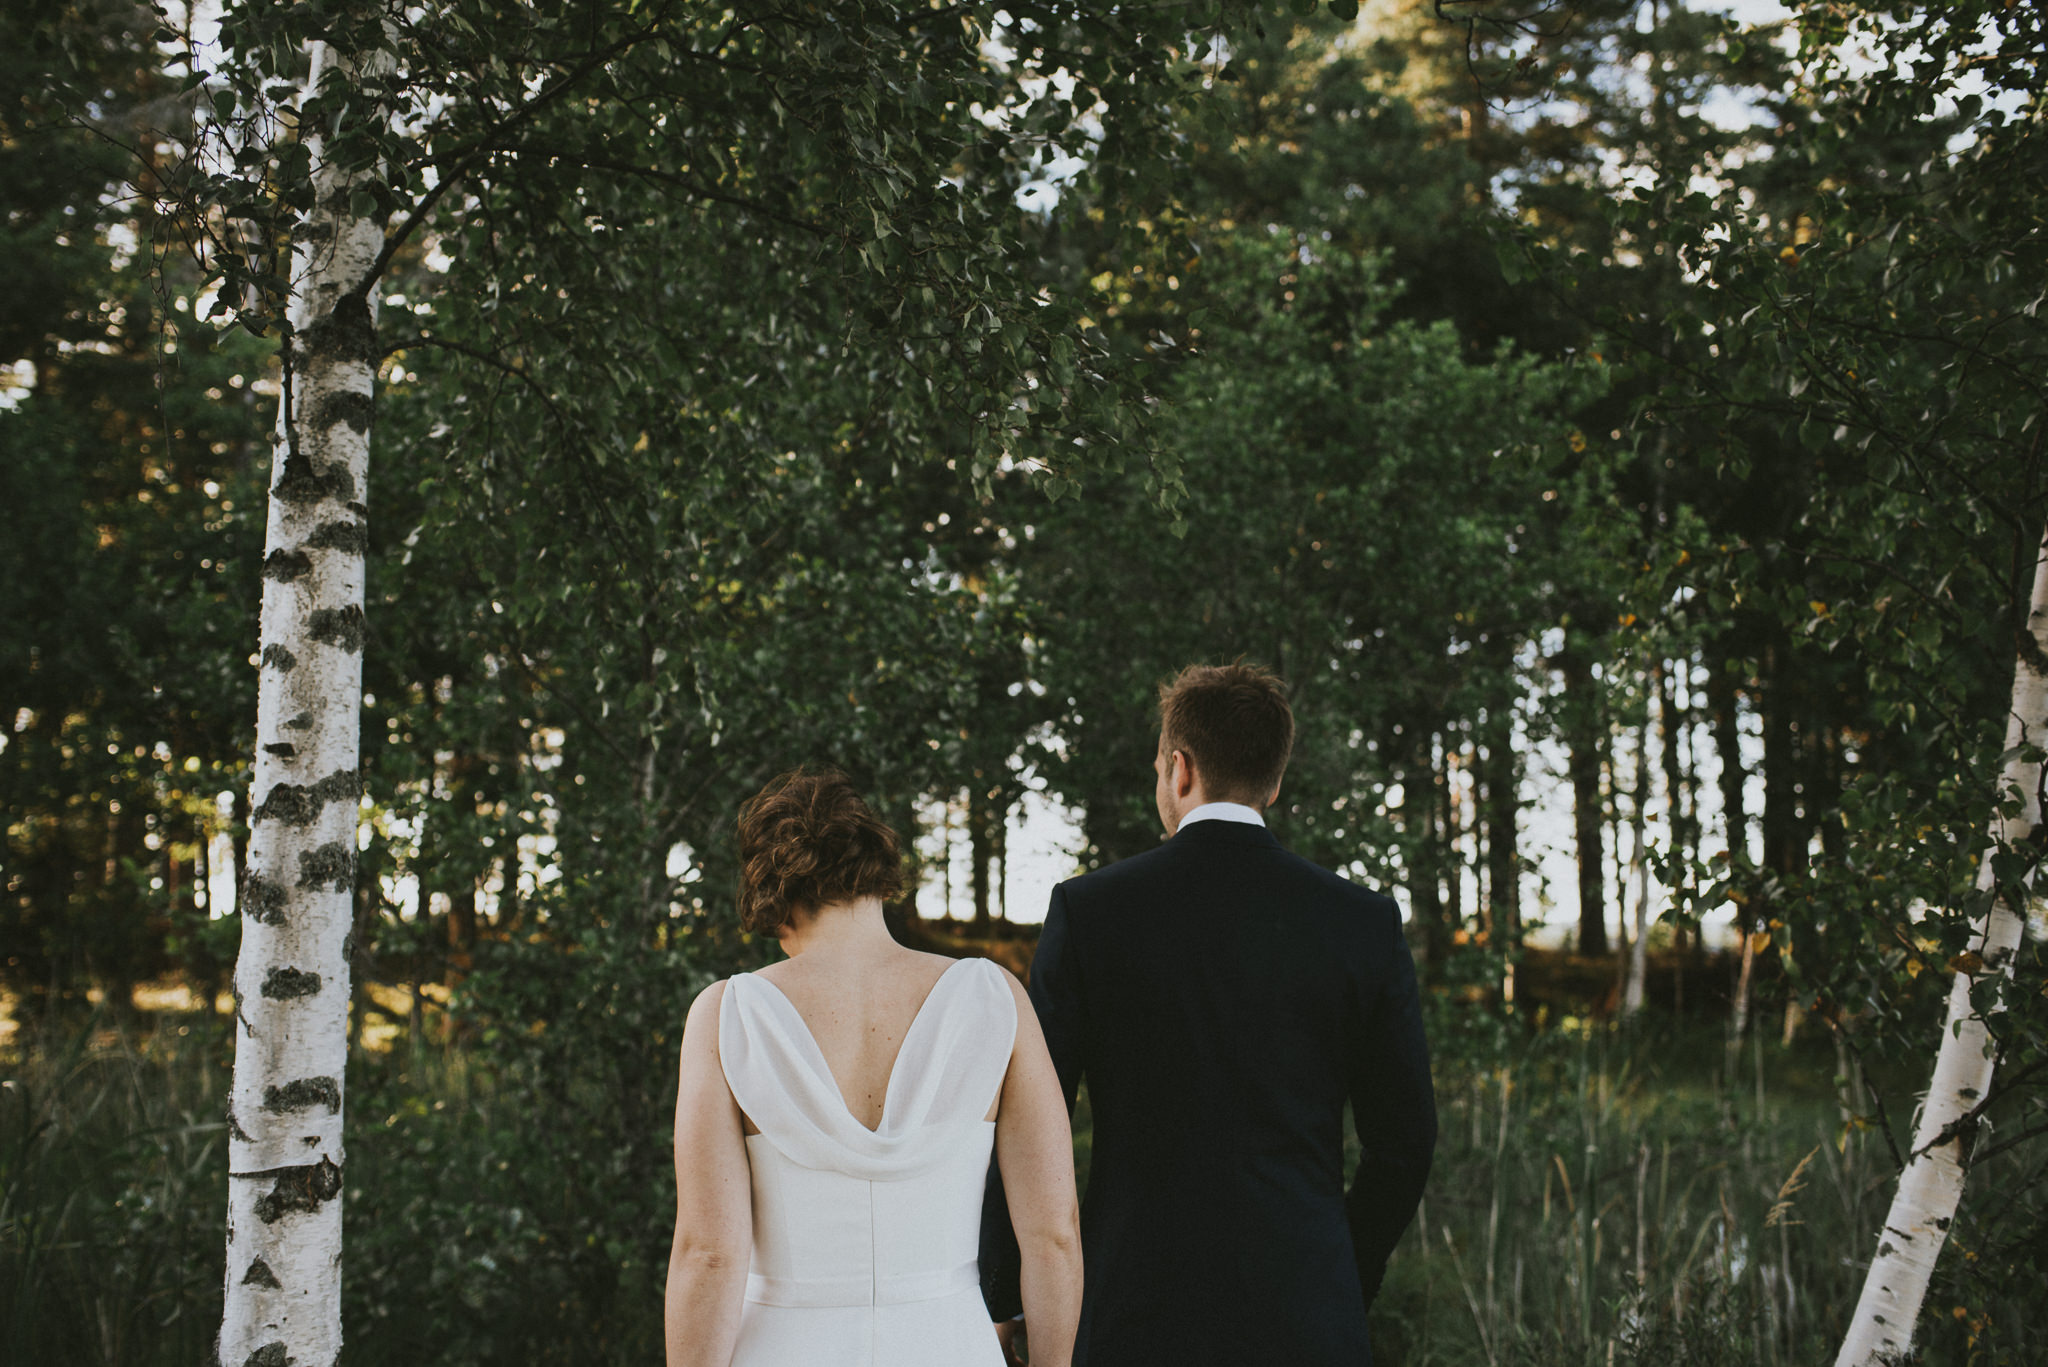 52-stjarnsund-sweden-wedding-martarobin-web-4848.jpg